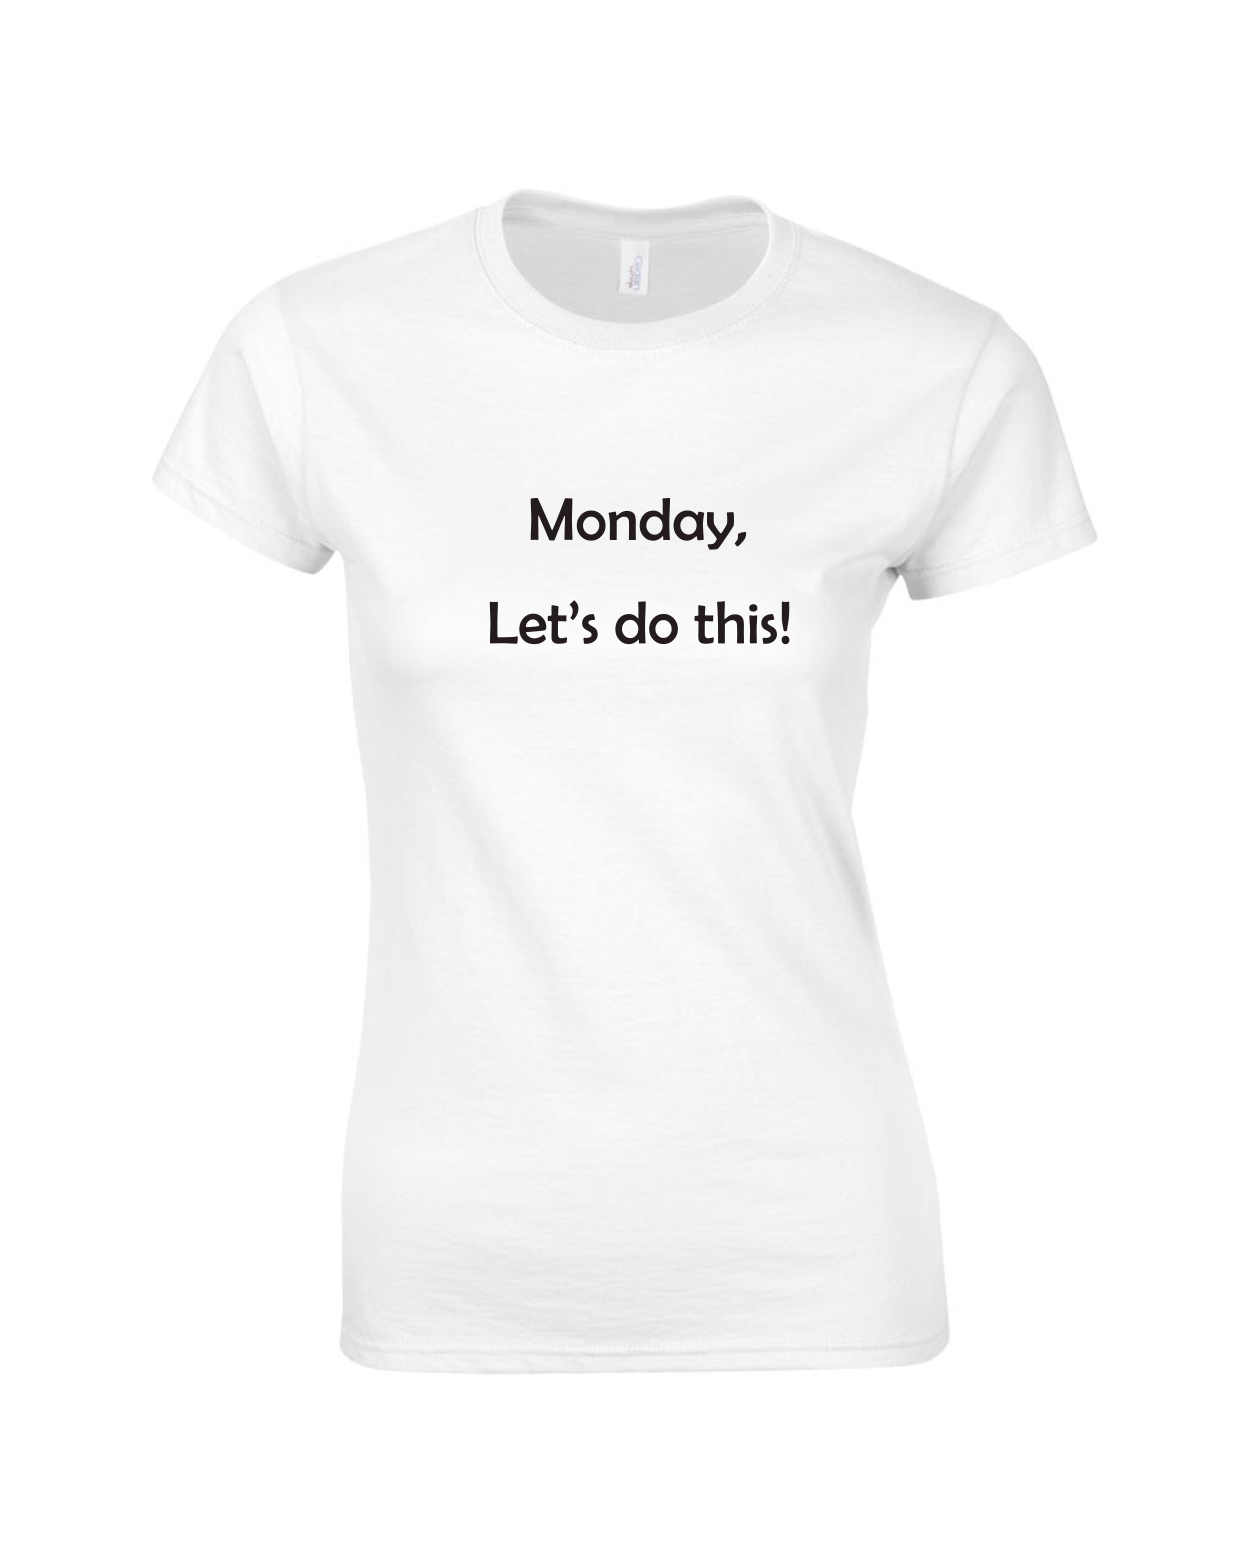 Tricou bumbac dama unisex alb negru imprimat serigrafie Monday